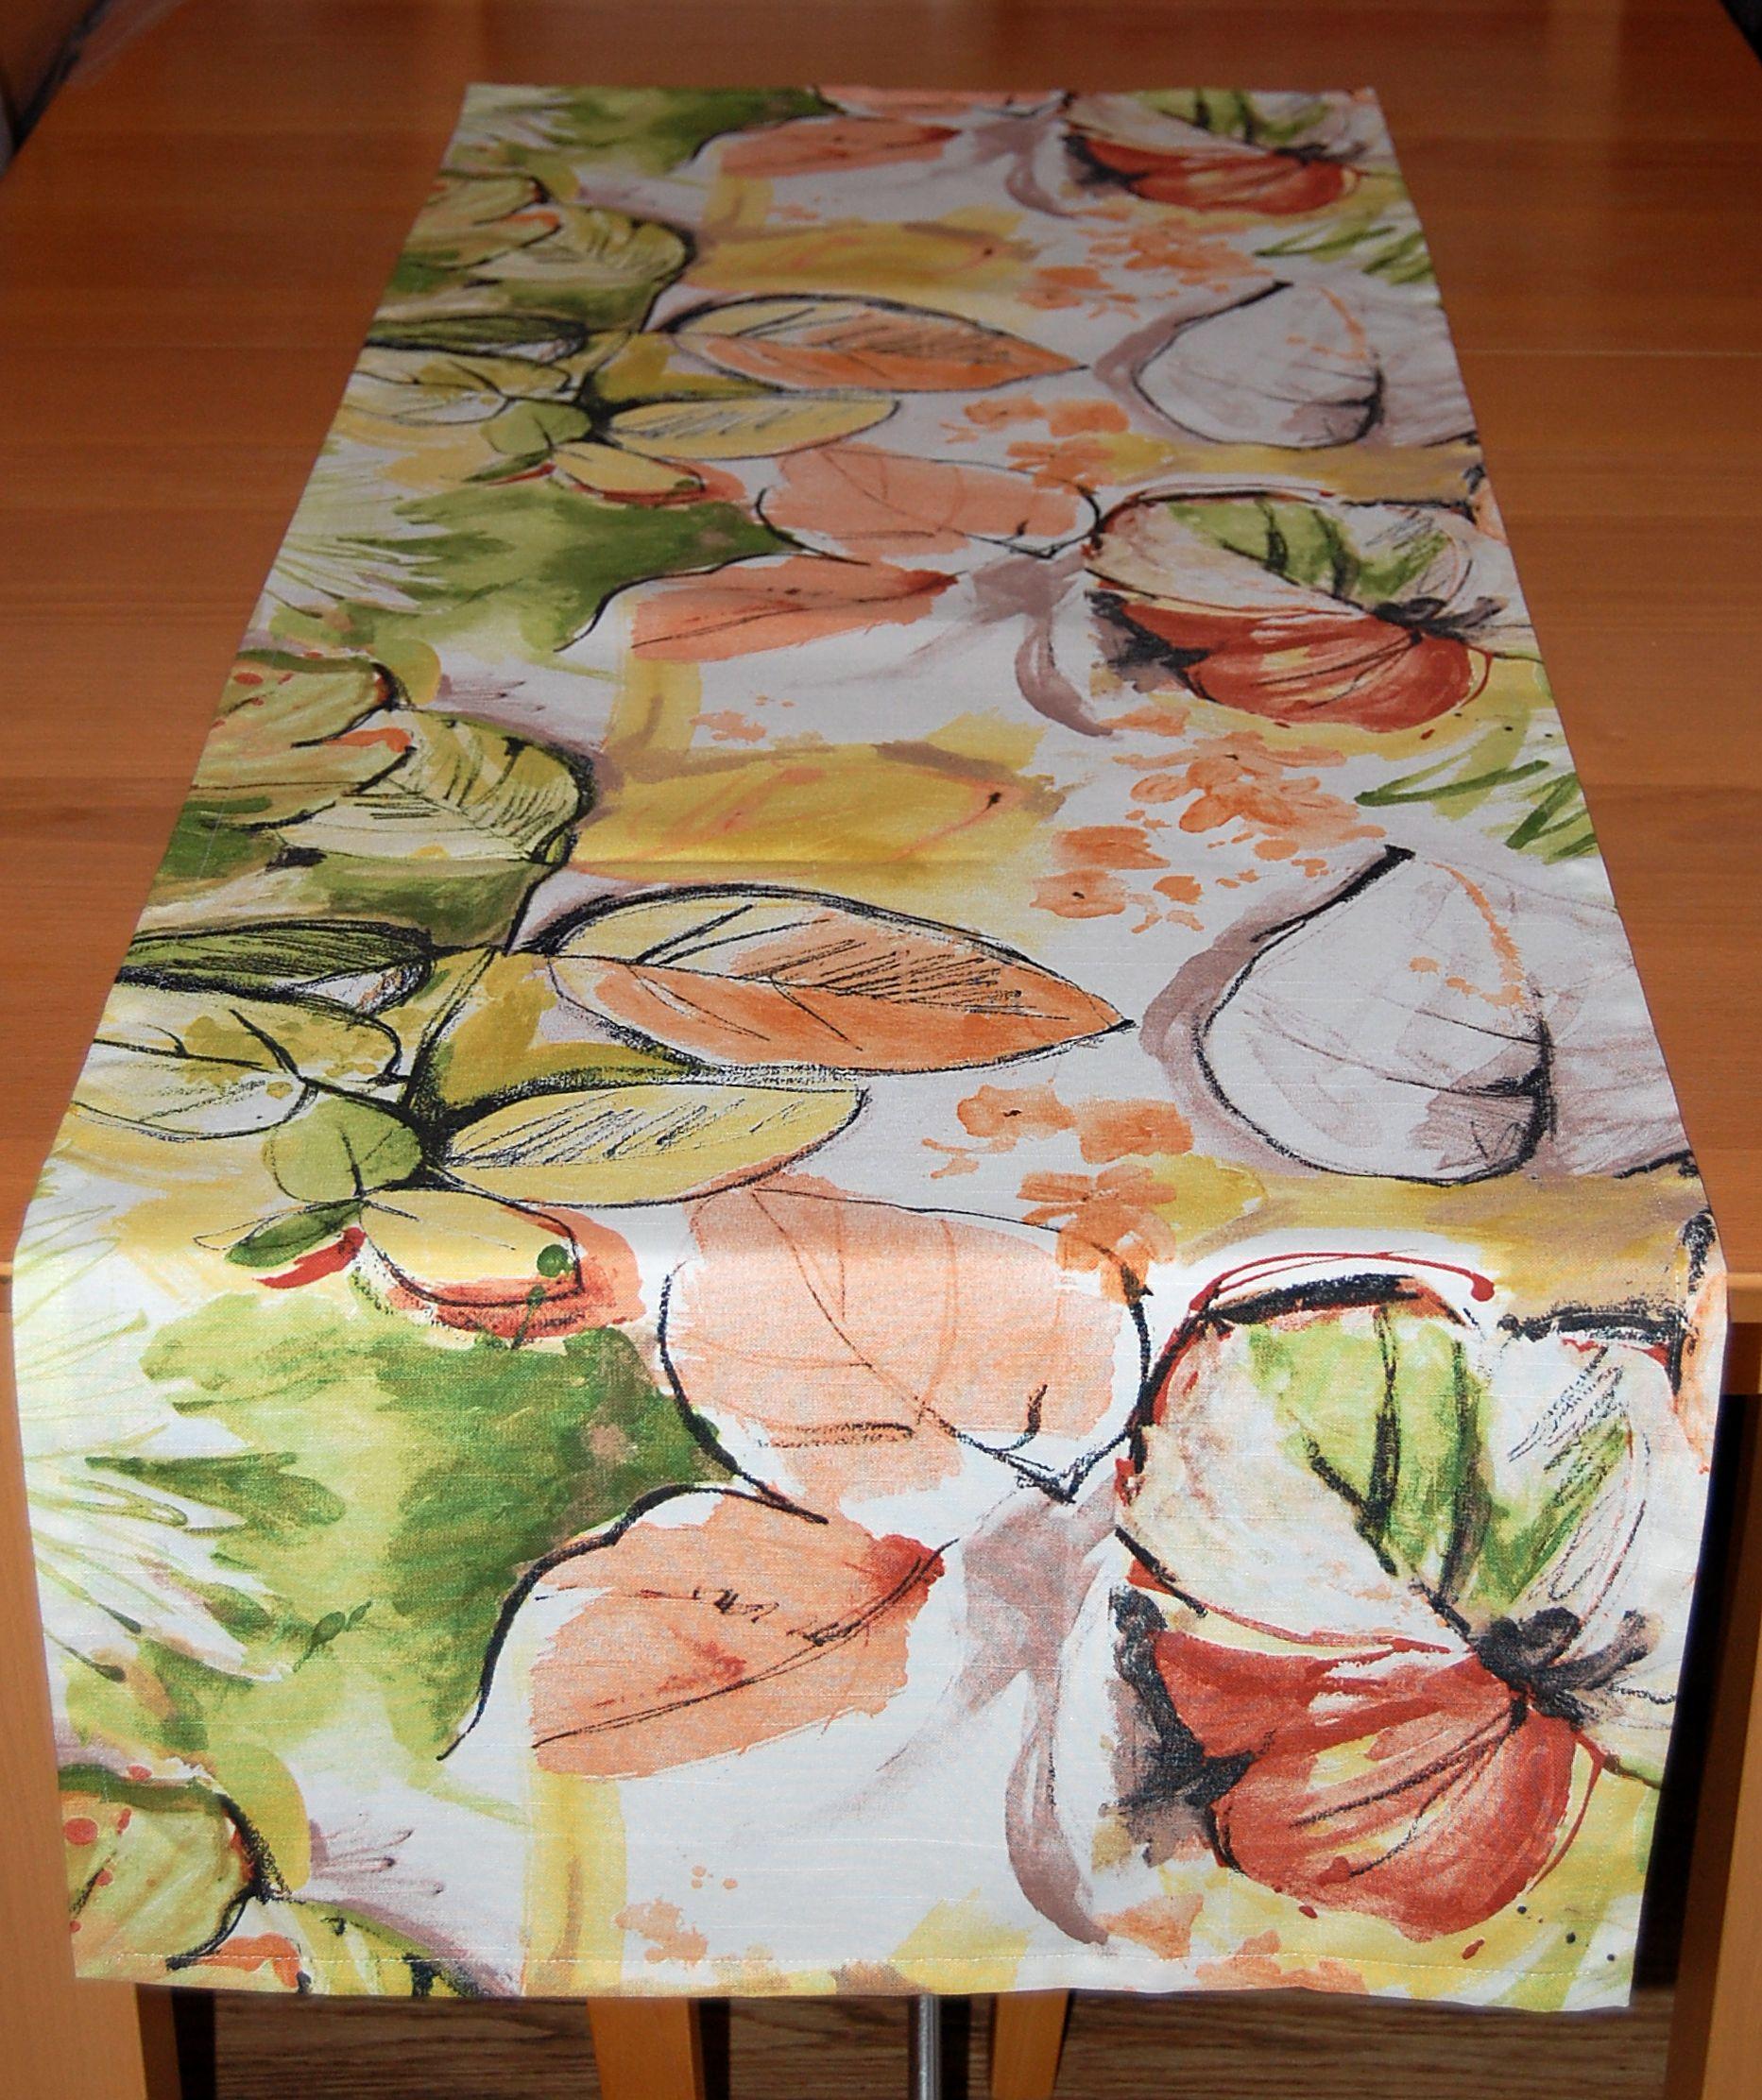 tischdecke herbst modern bl tter digitaldruck orange gr n. Black Bedroom Furniture Sets. Home Design Ideas